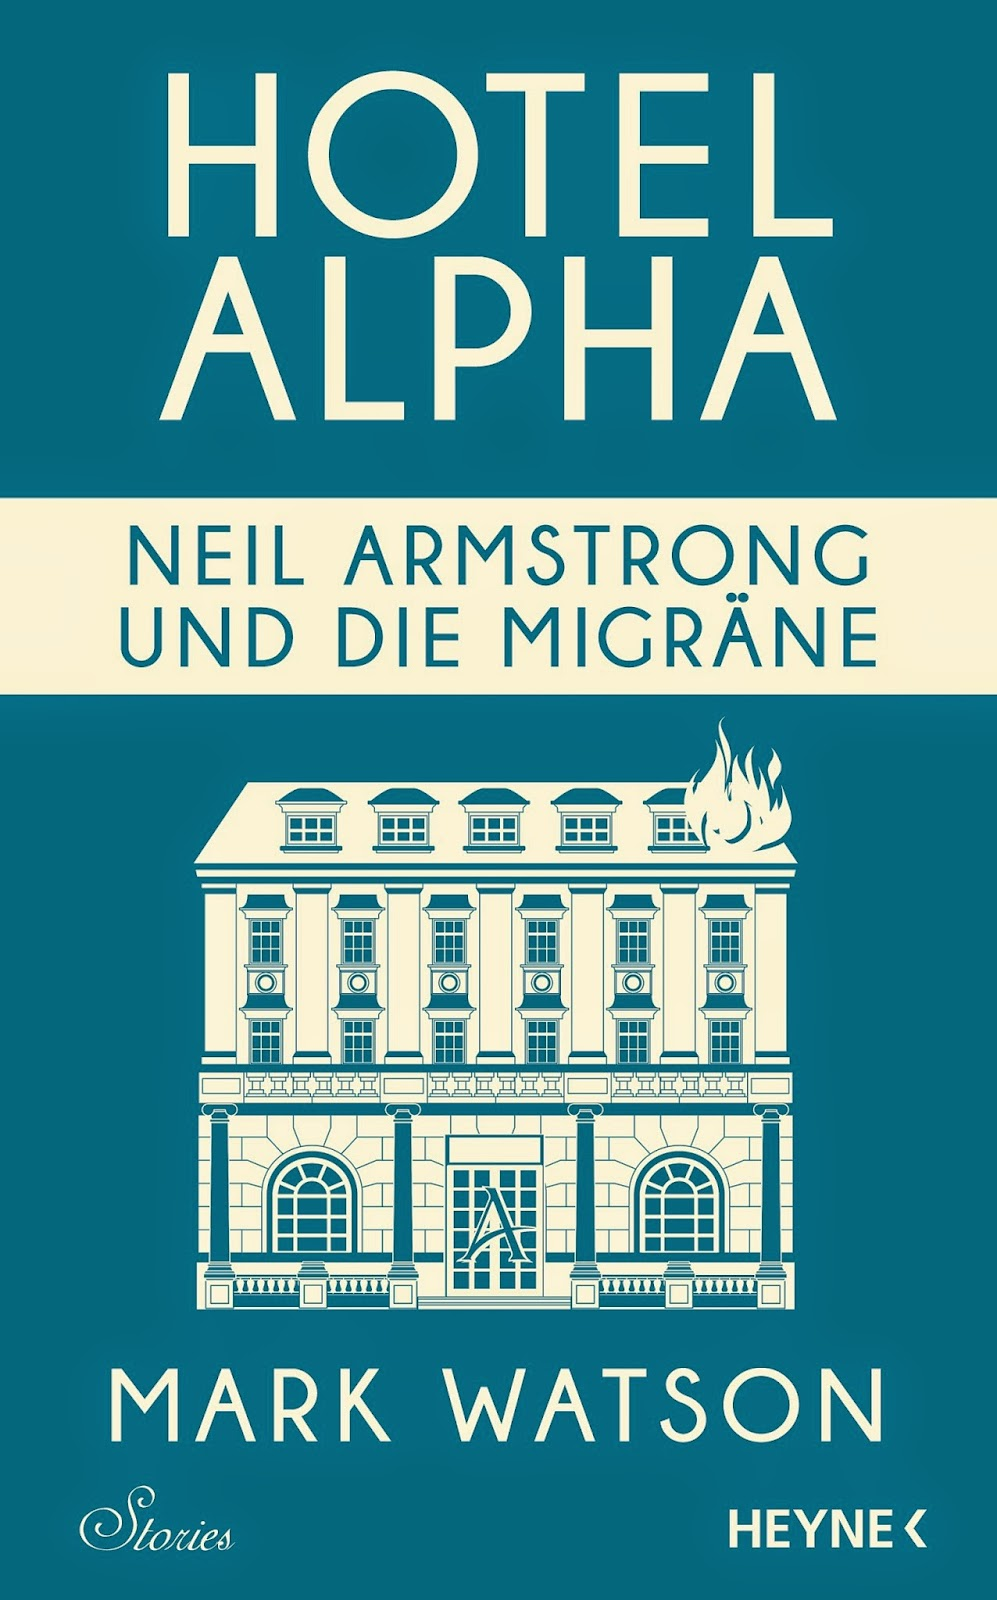 http://www.randomhouse.de/ebook/Neil-Armstrong-und-die-Migraene-Hotel-Alpha-Stories/Mark-Watson/e489898.rhd